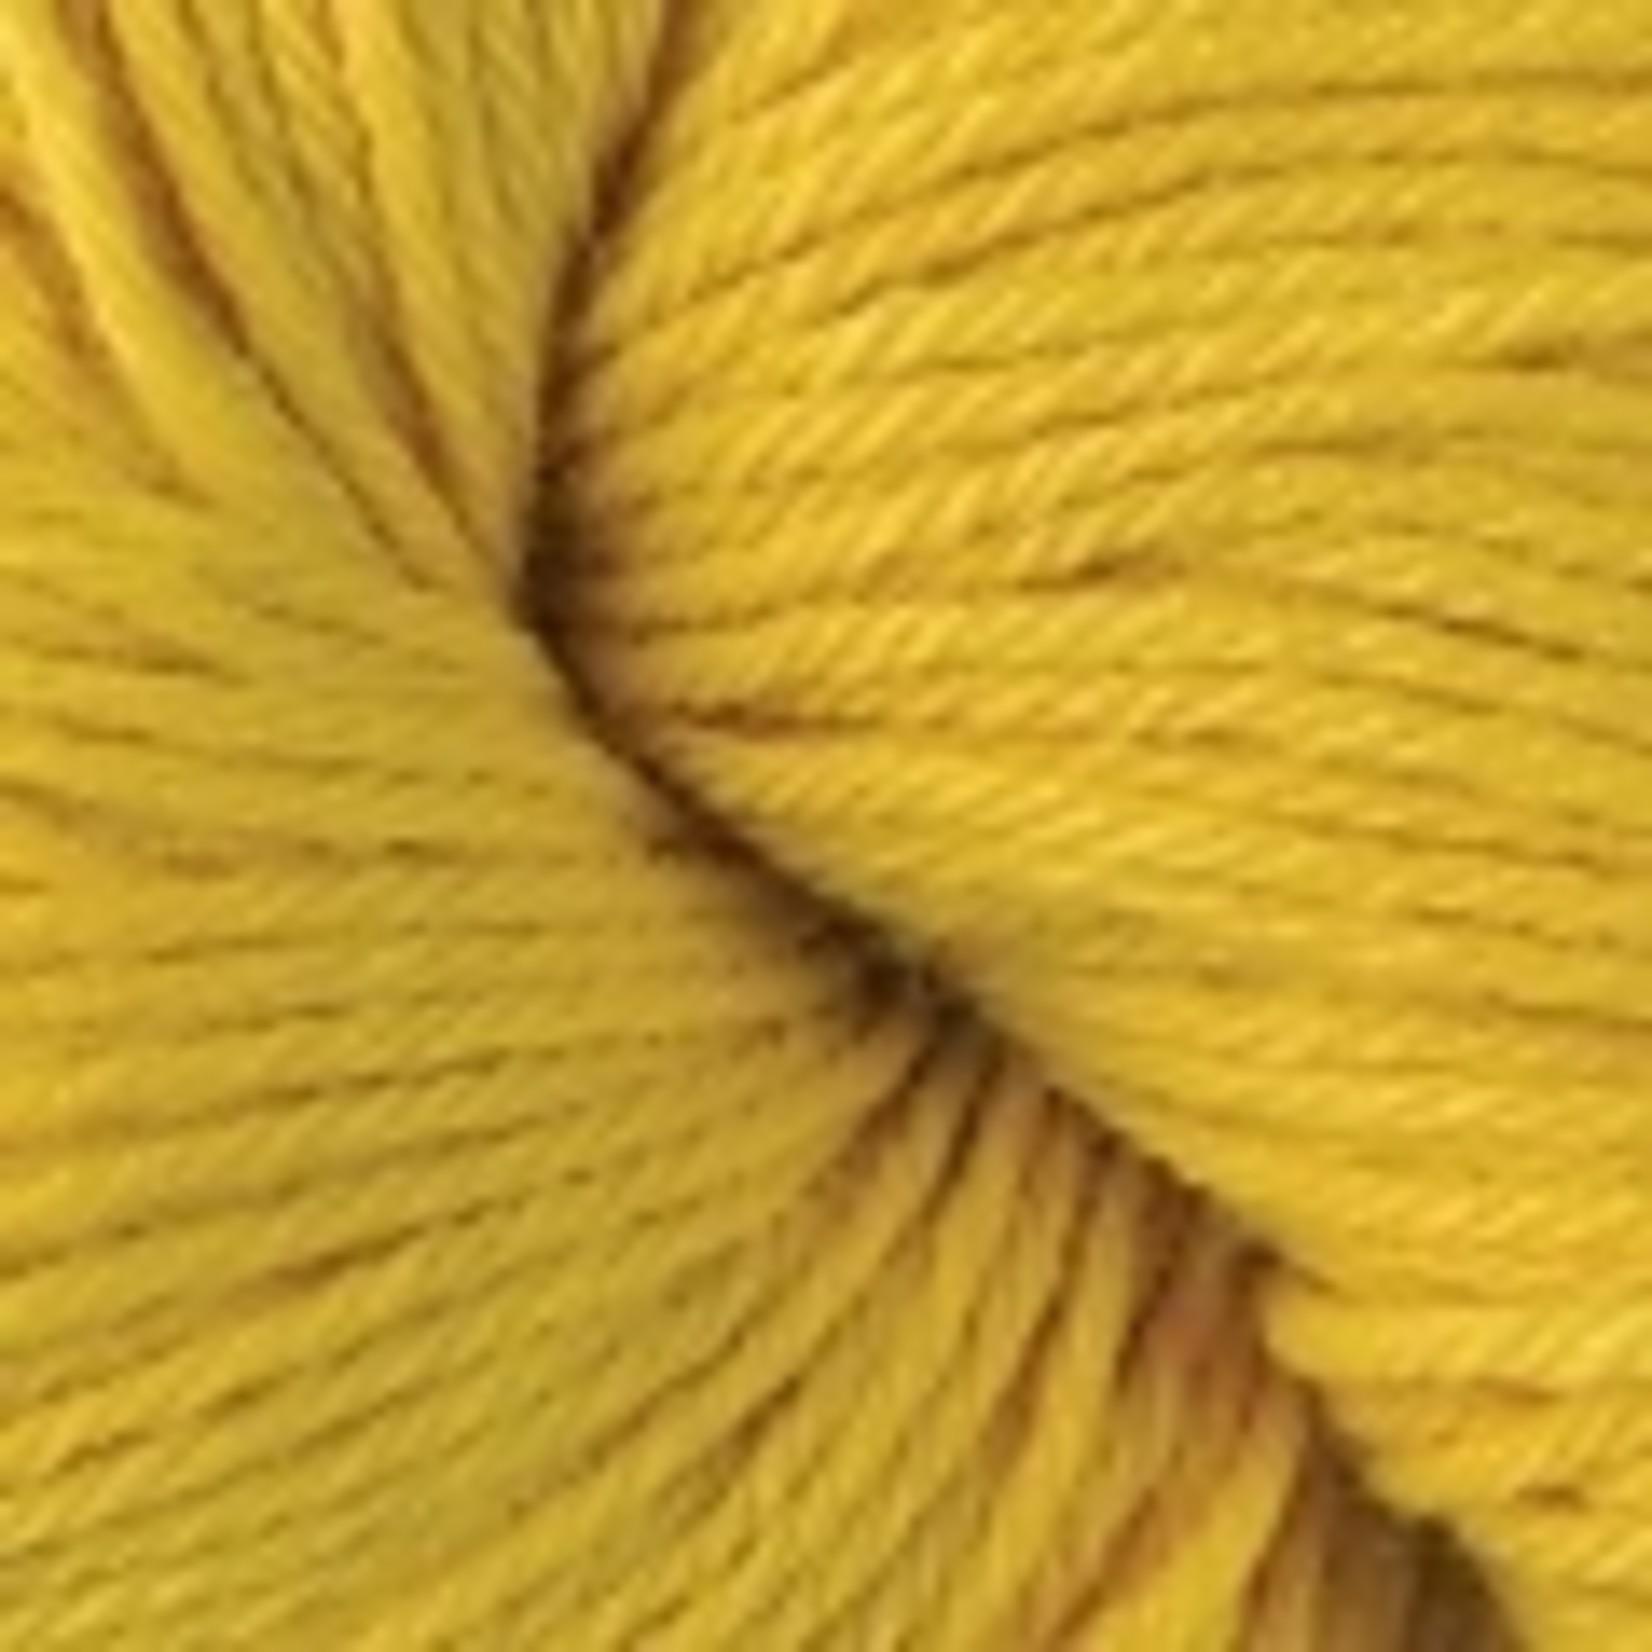 Berroco Vintage Wool, 51131, Citrus